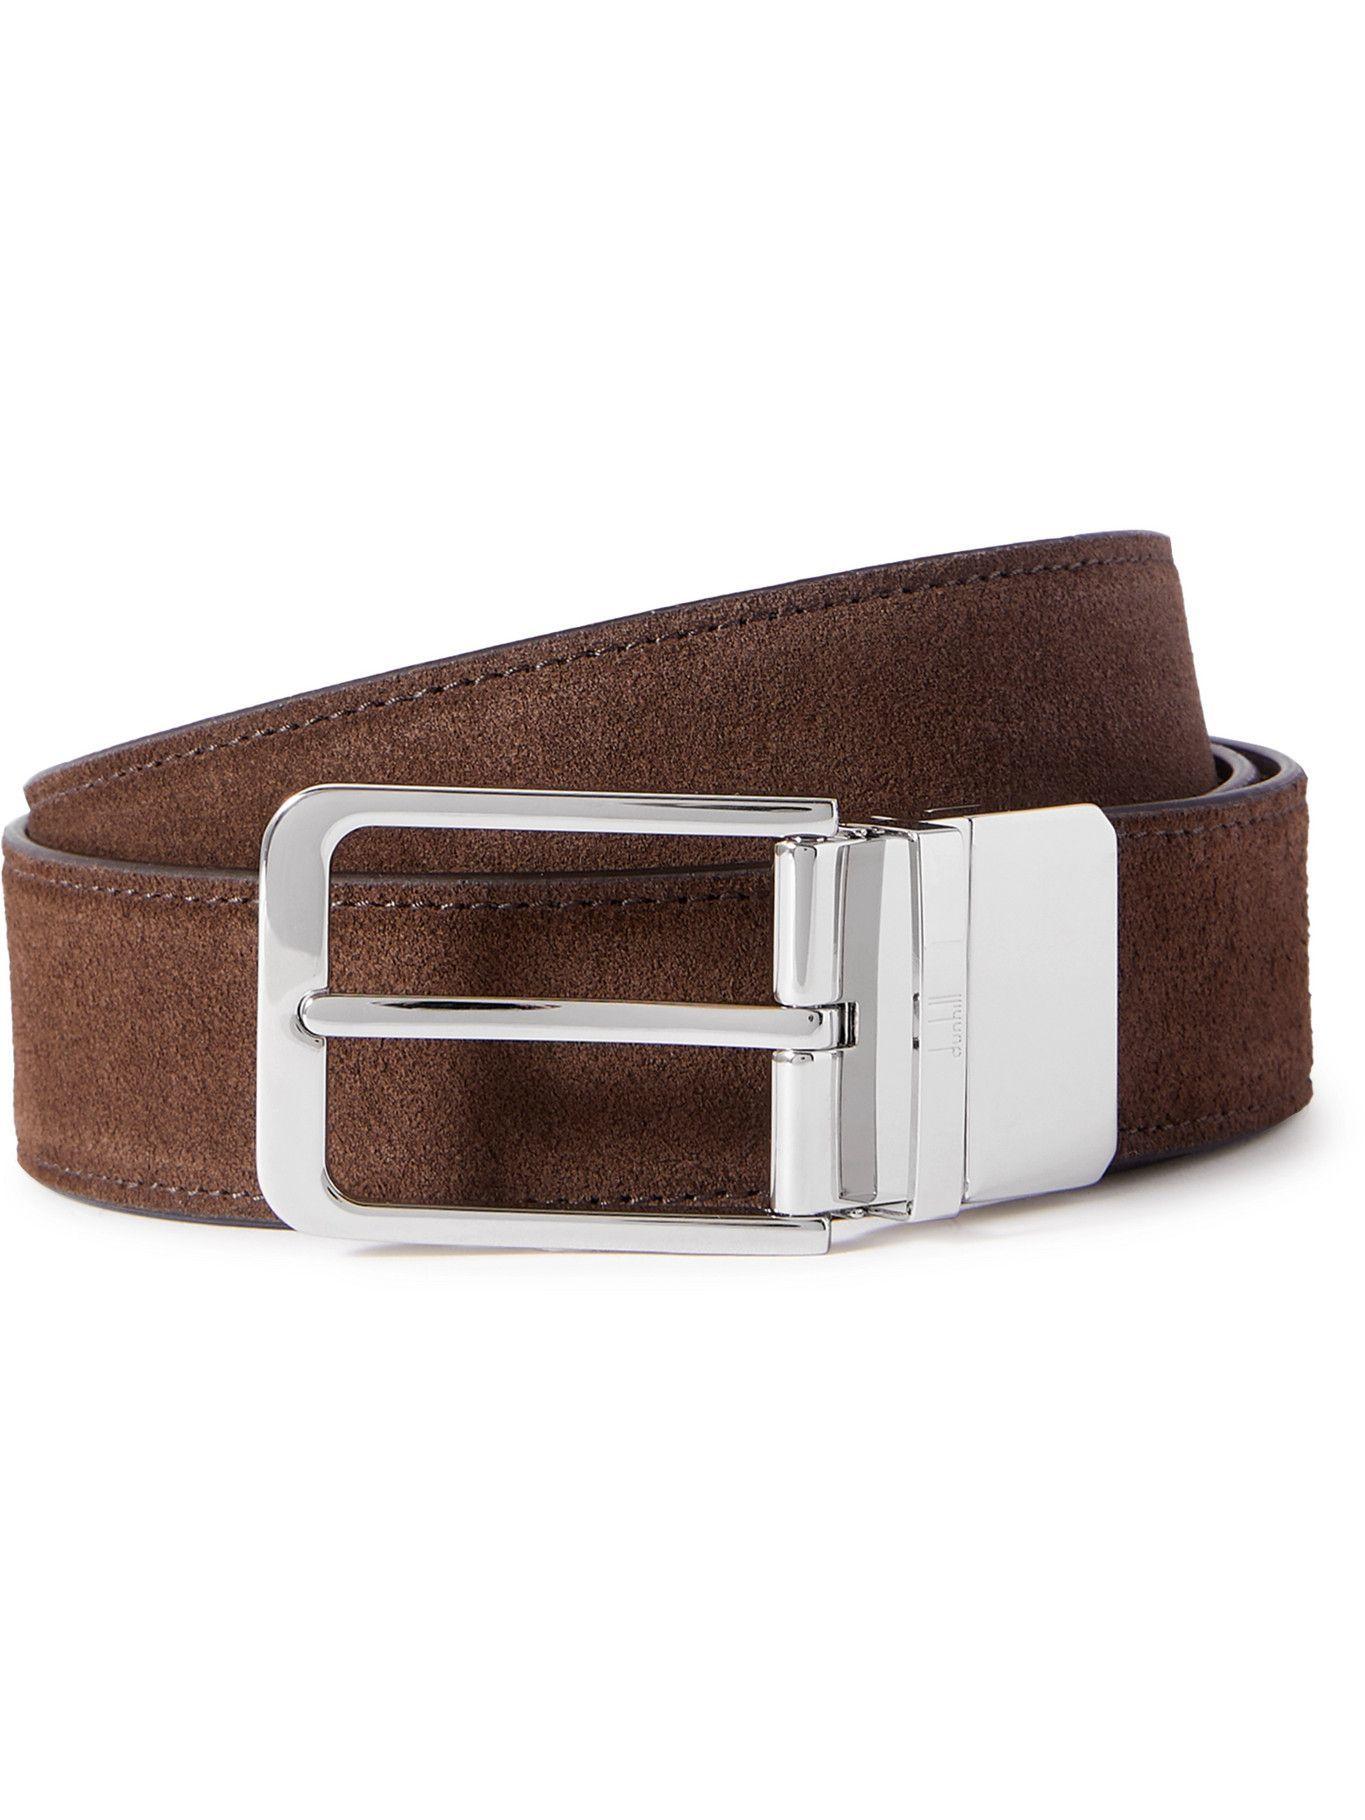 DUNHILL - 3.5cm Suede Belt - Brown